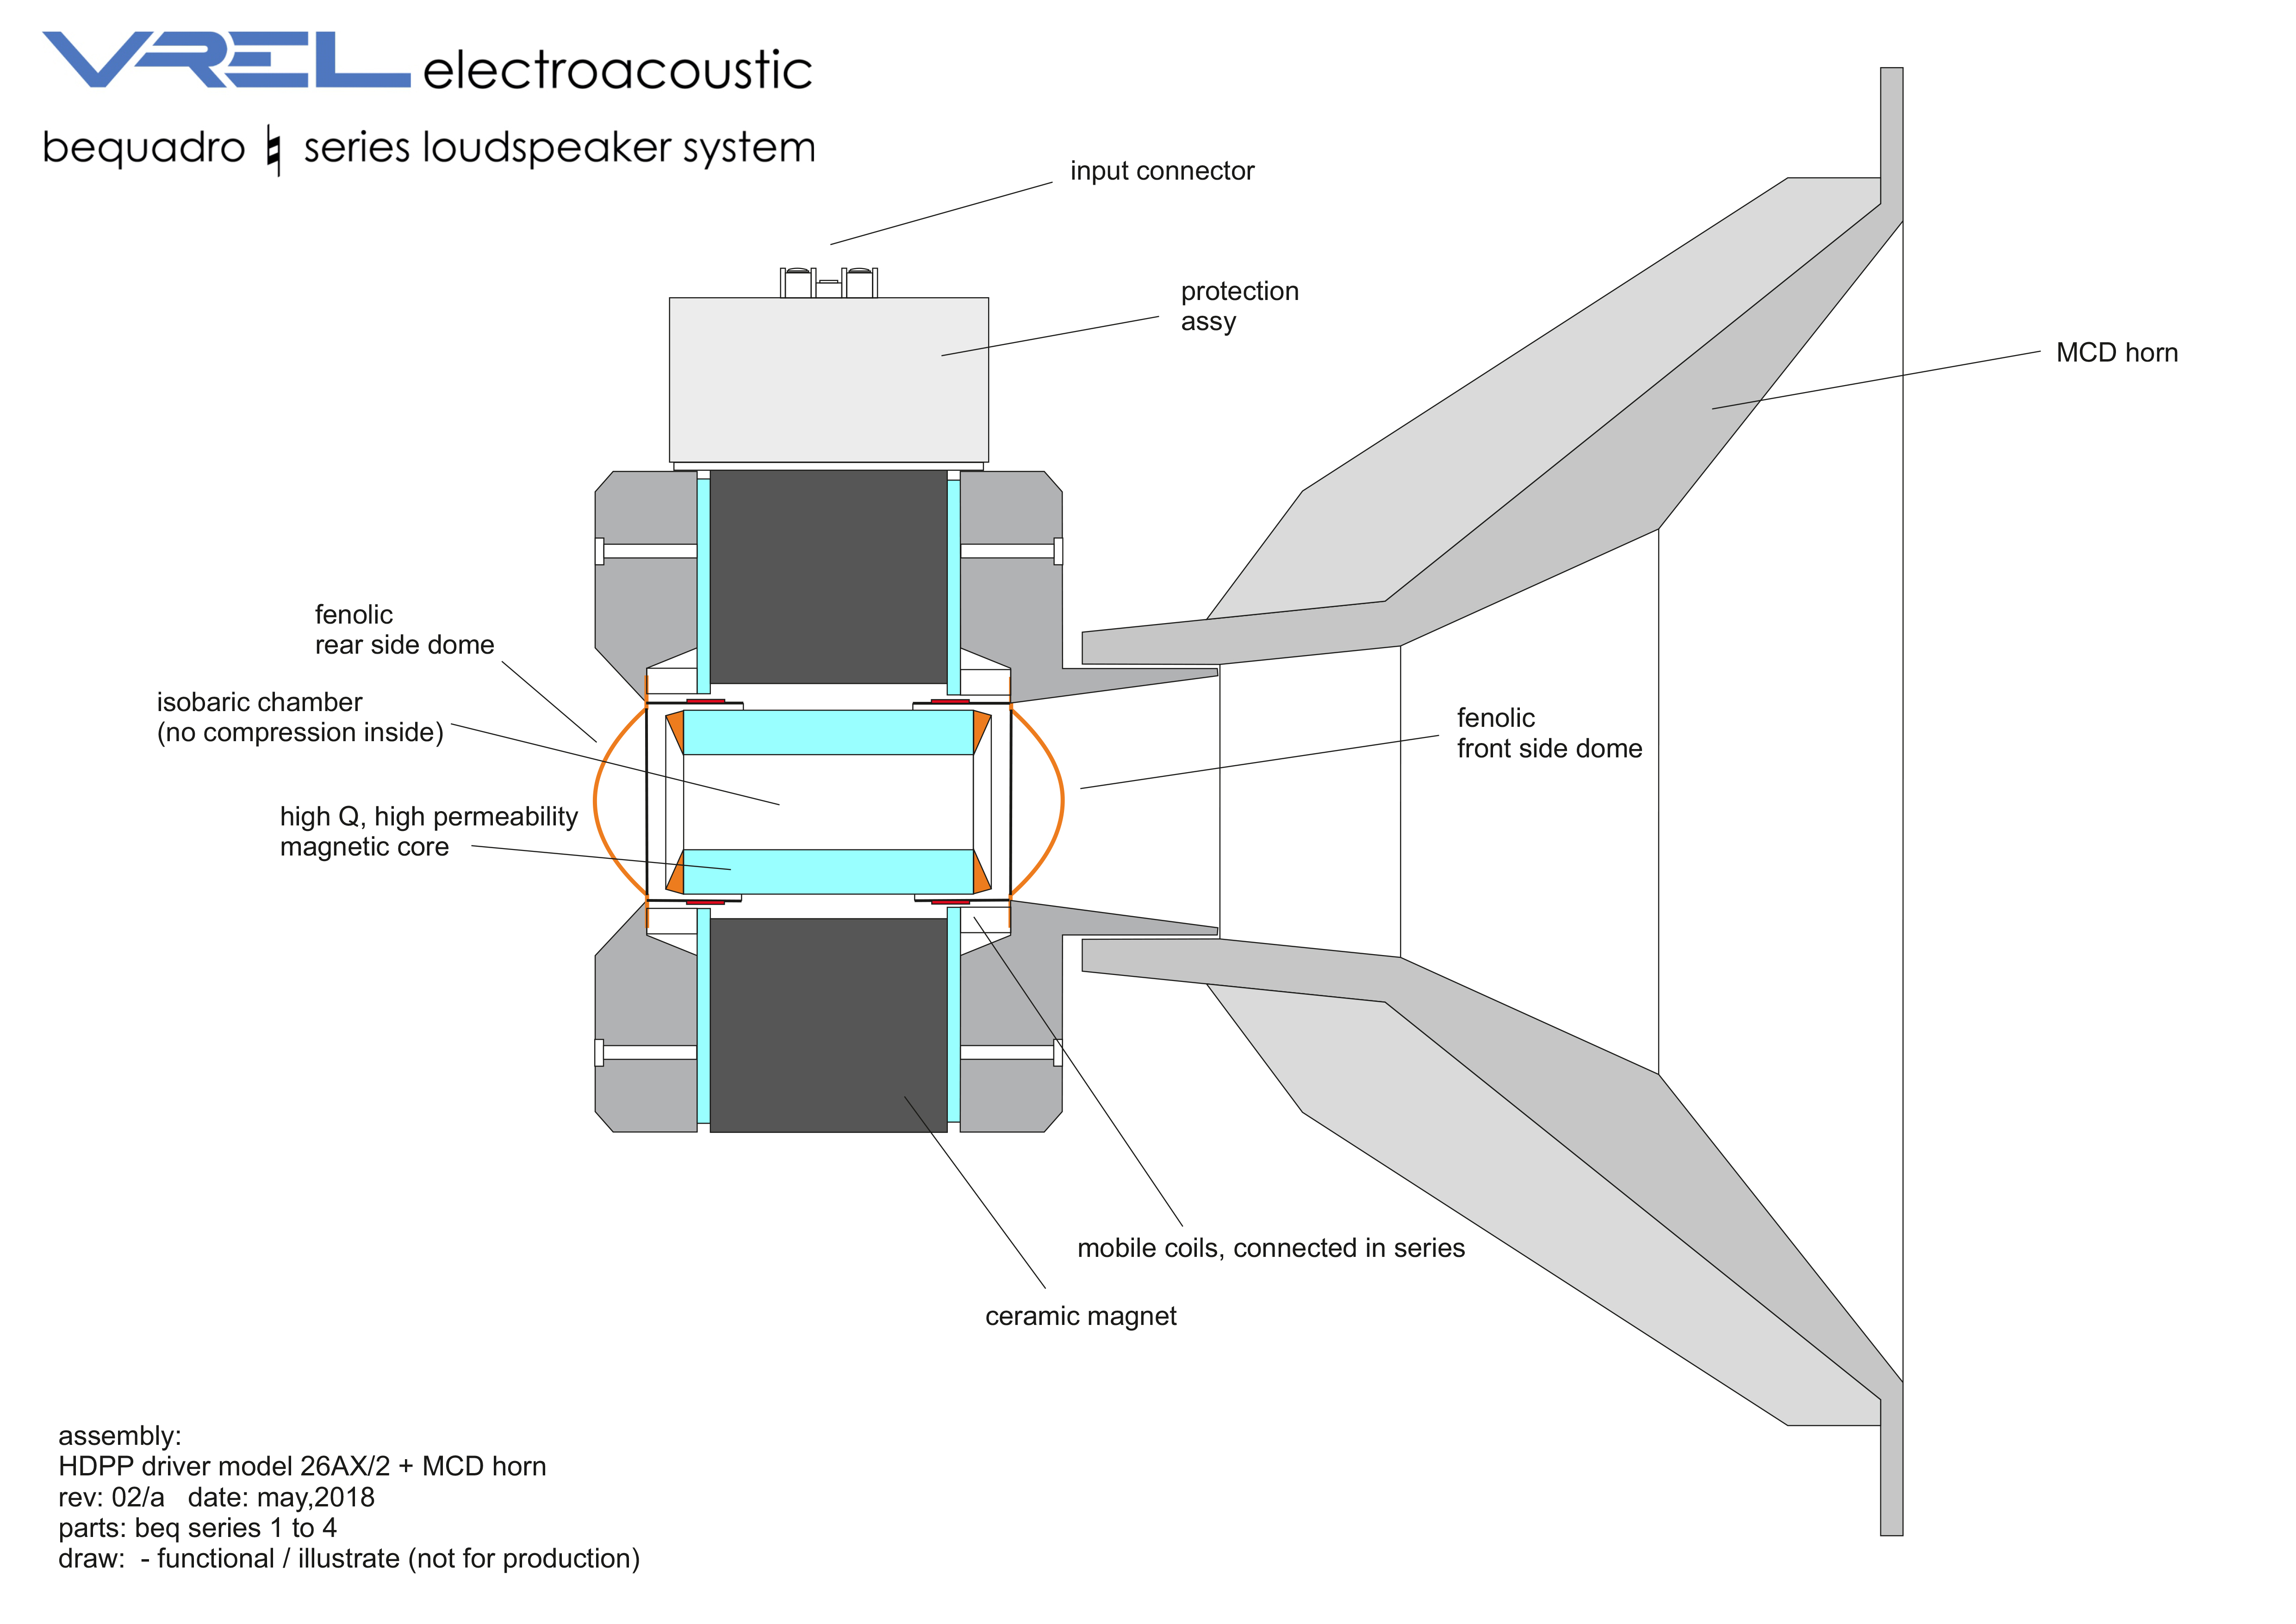 Vrel Electroacustic HDPP 2